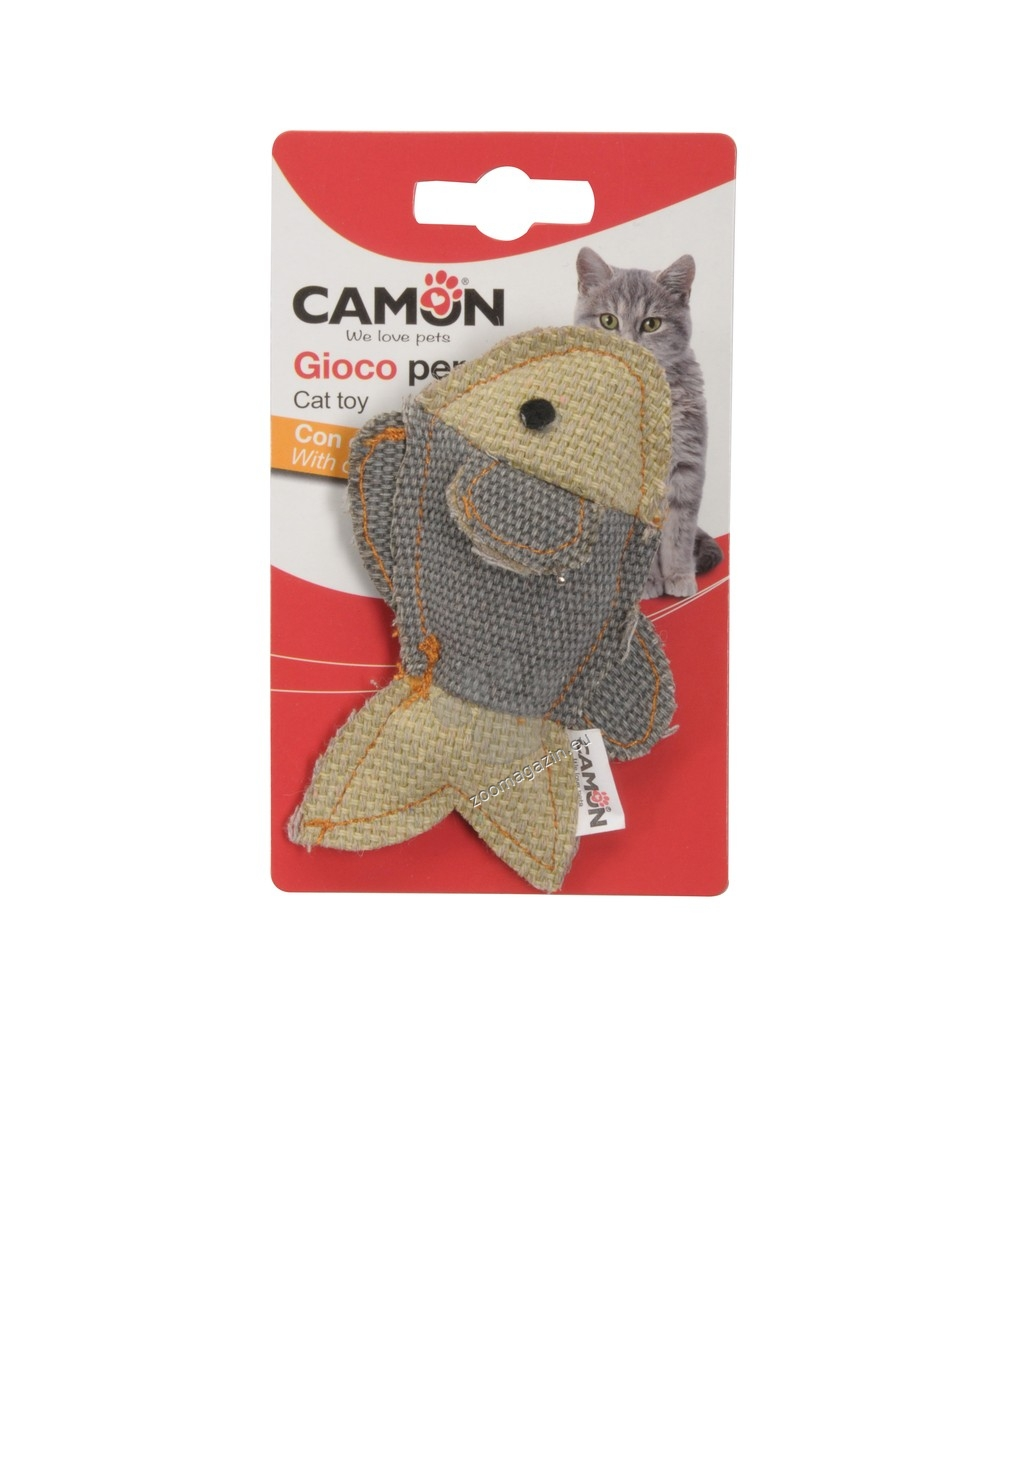 Camon Cat toy with catnip - denim fishes - котешка играчка